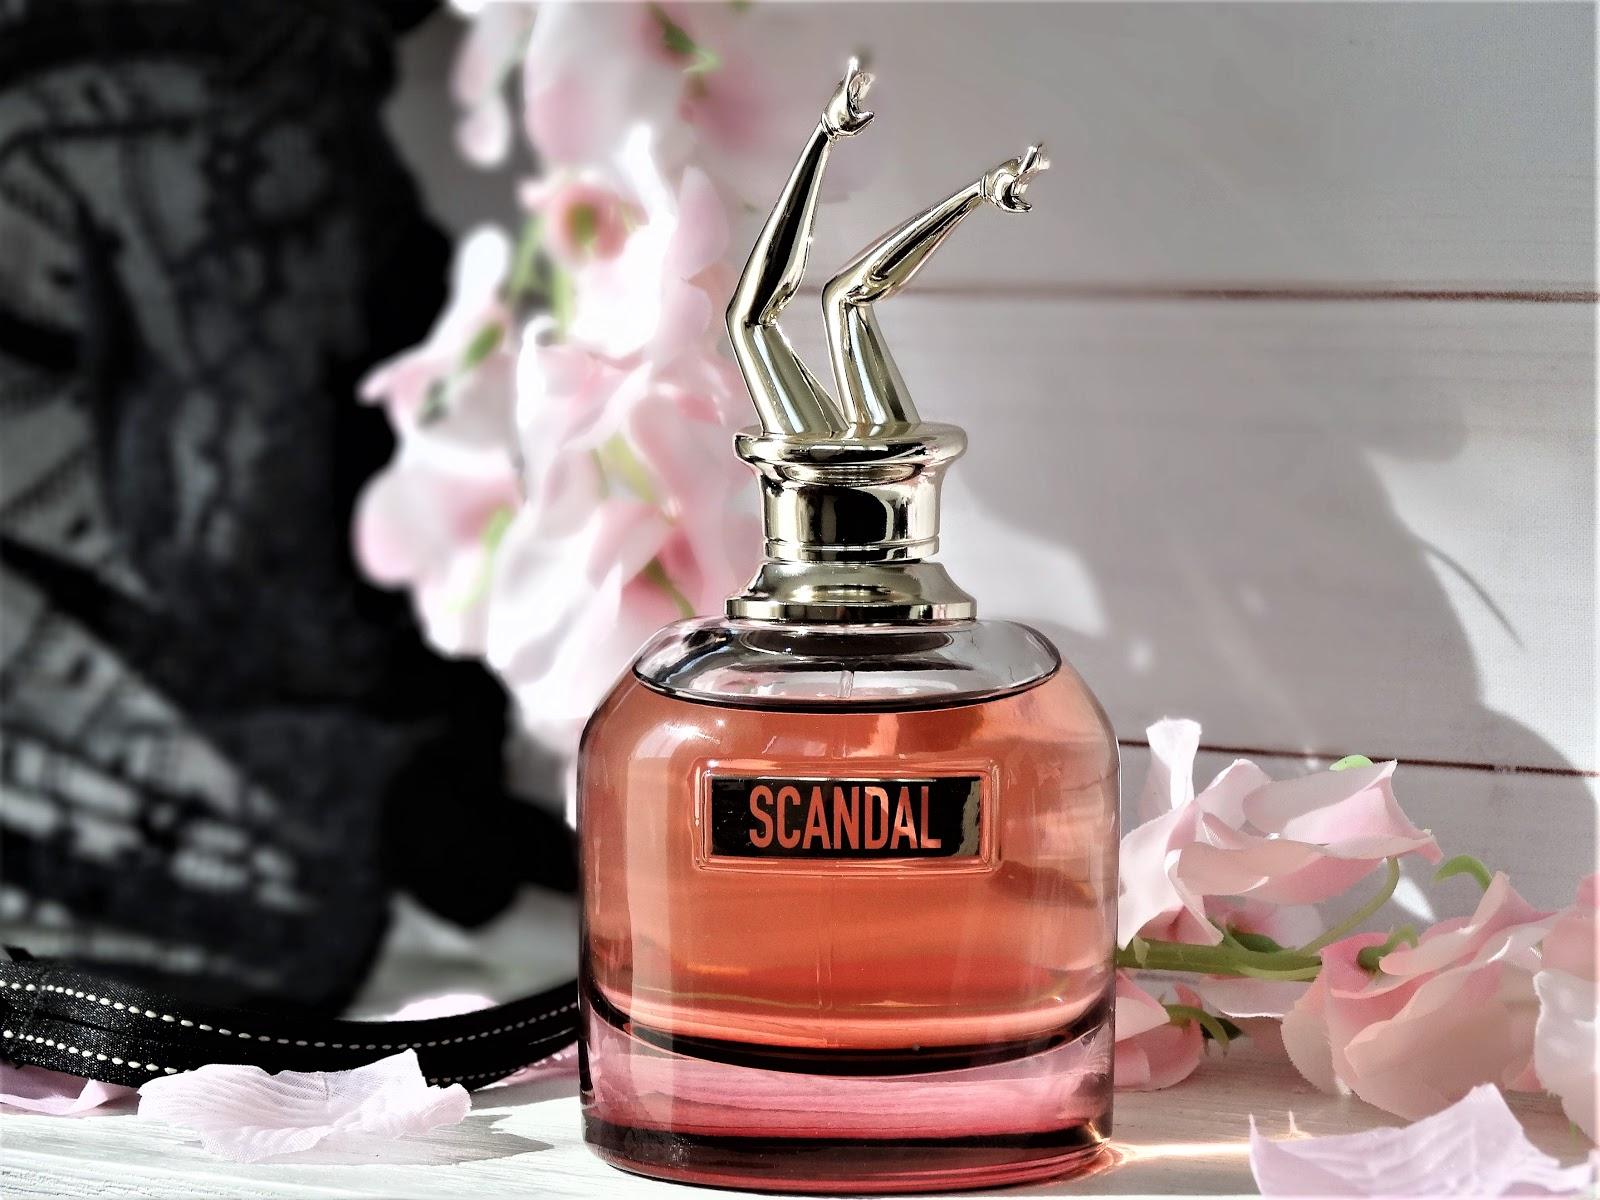 Scandal By Night De Jean Paul Gaultier Scandaleusement Gourmand